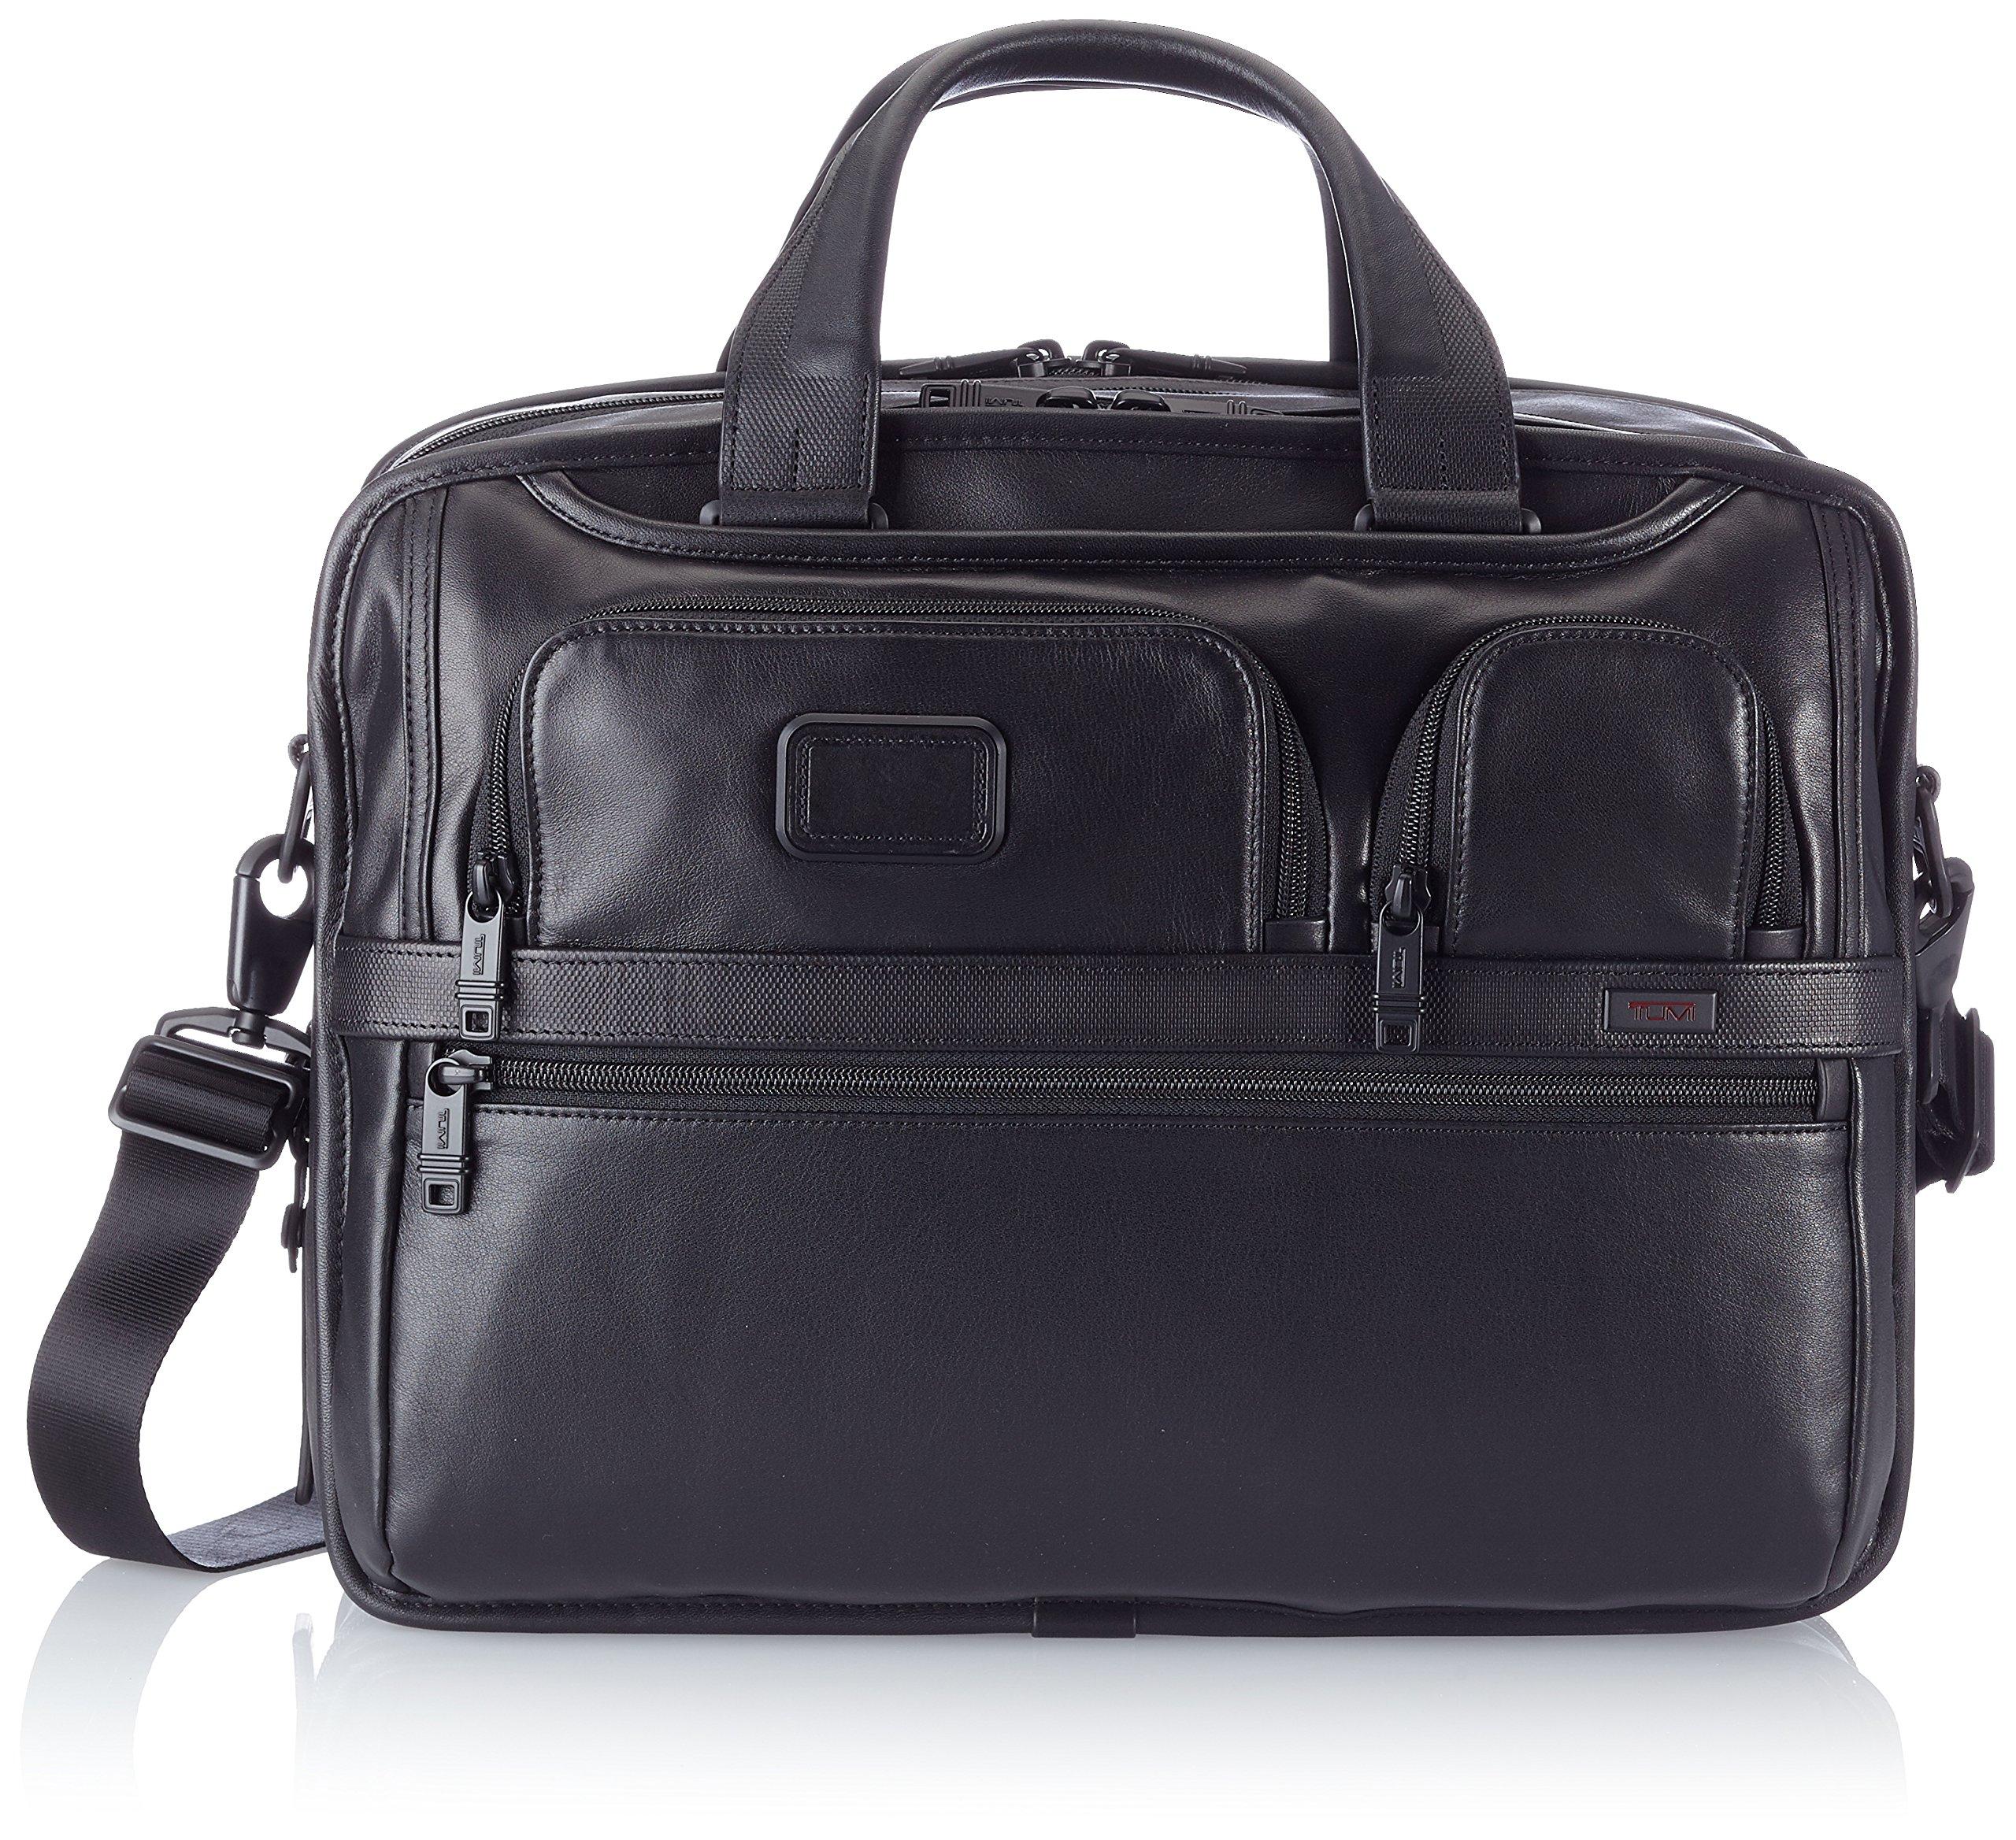 Tumi Alpha 2 Expandable Organizer Laptop Leather Brief, Black, One Size